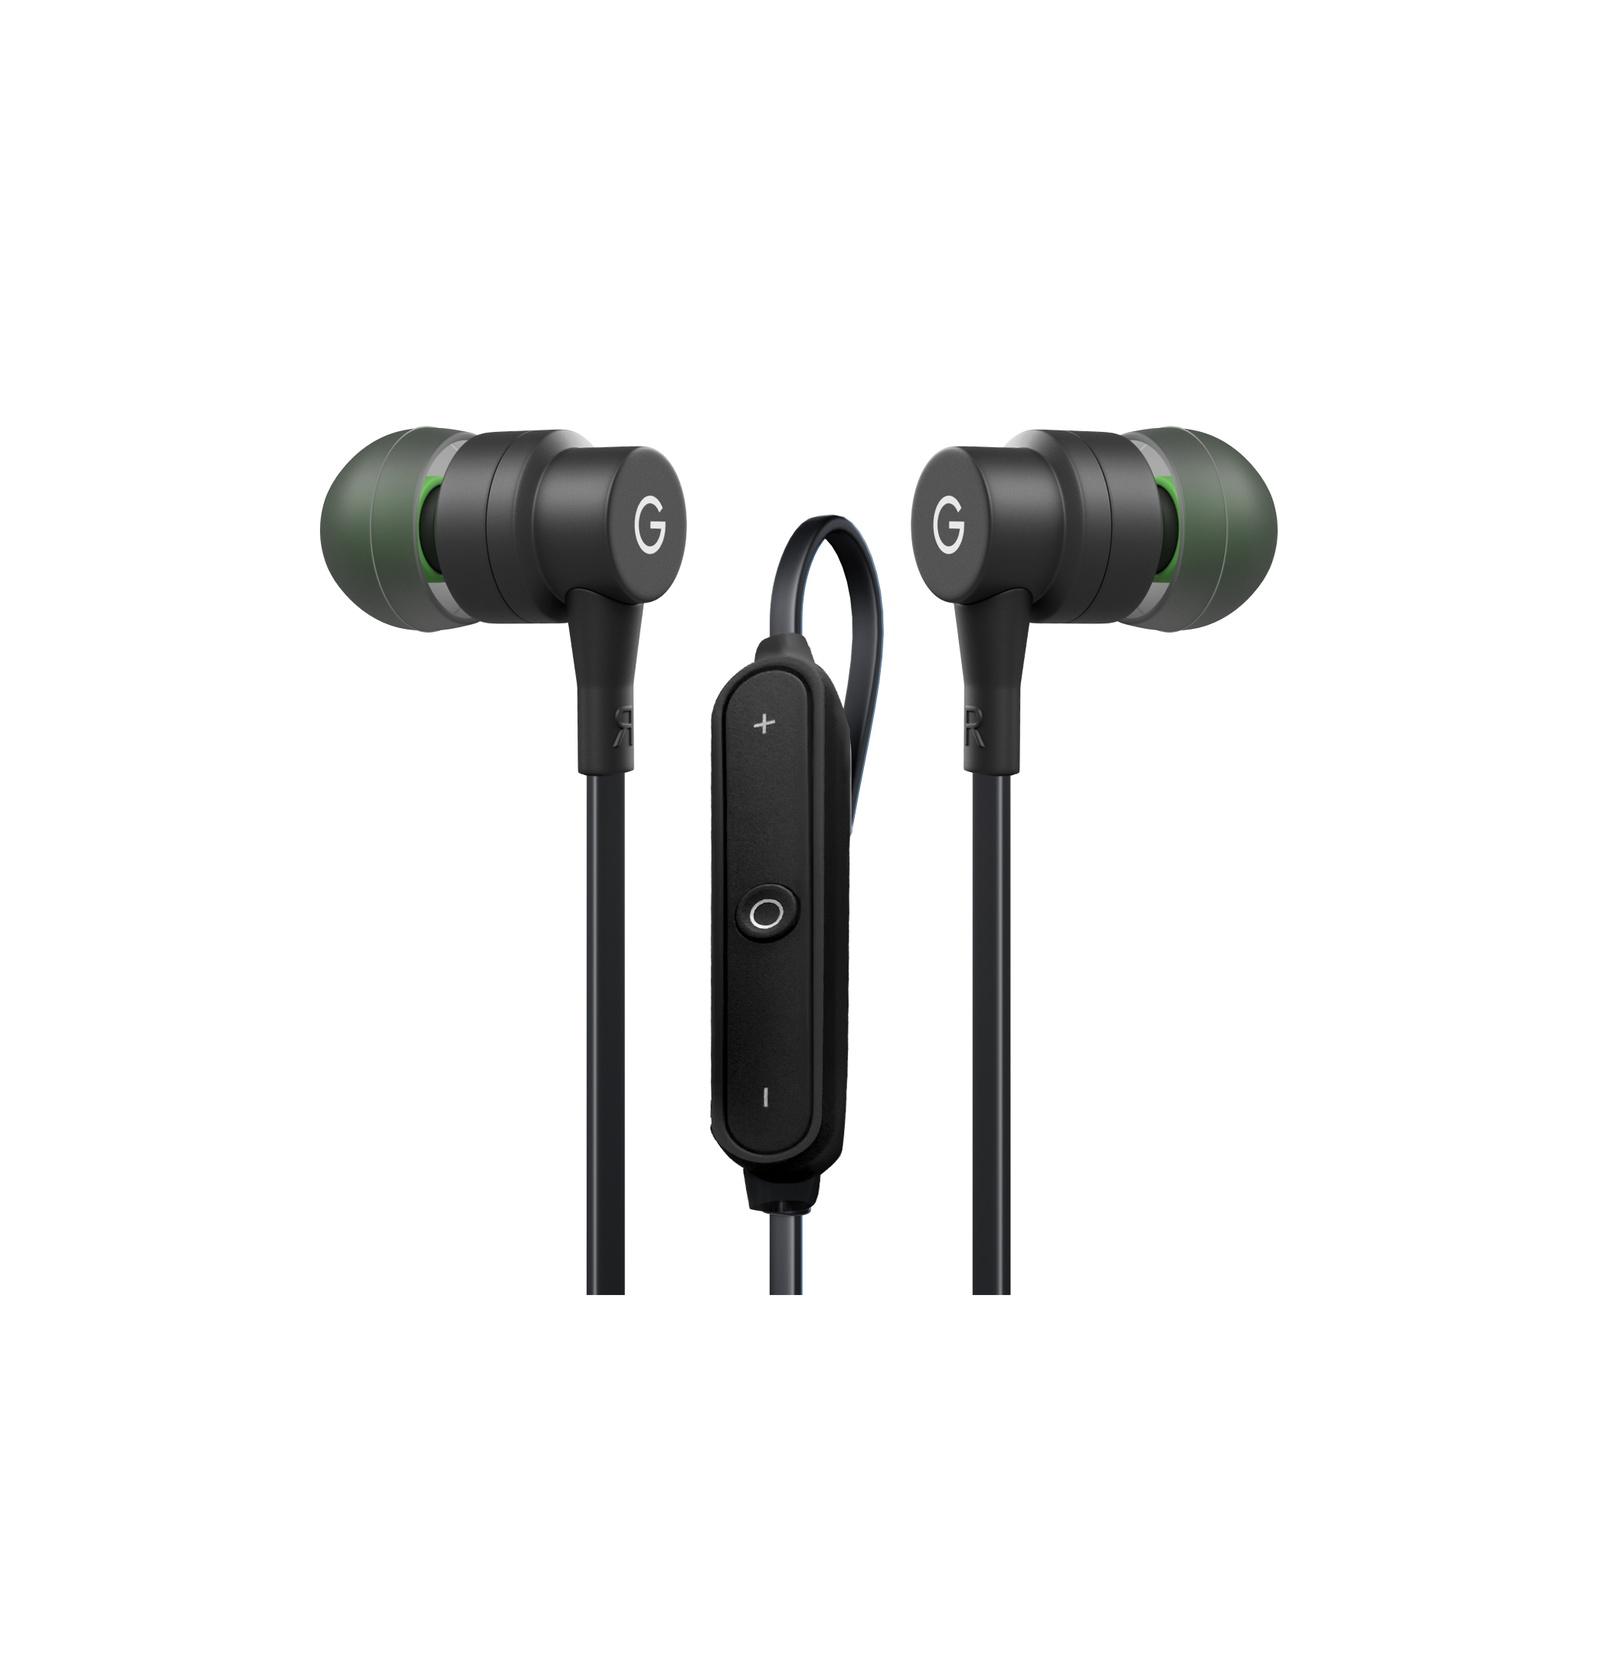 Bluetooth-гарнитура GAL BH-1002, черный блютуз стерео гарнитура для нокиа